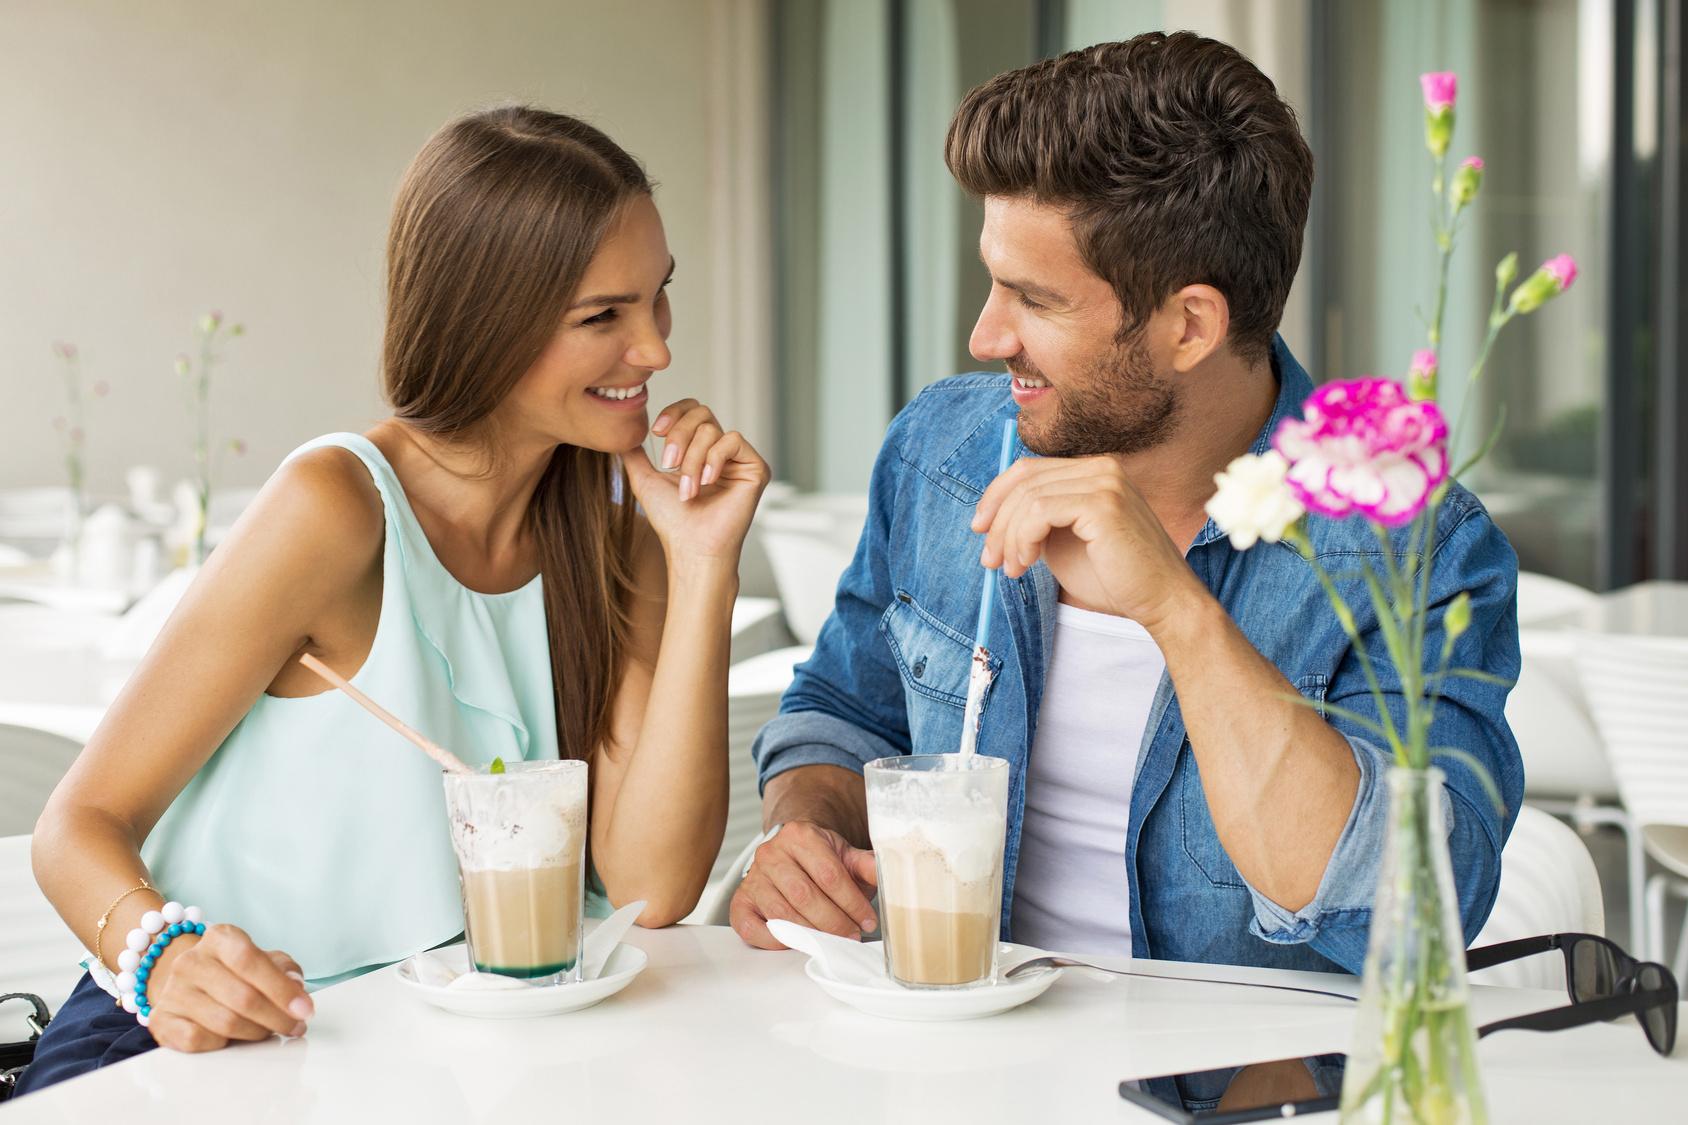 Как вести себя на свидании в кафе или ресторане